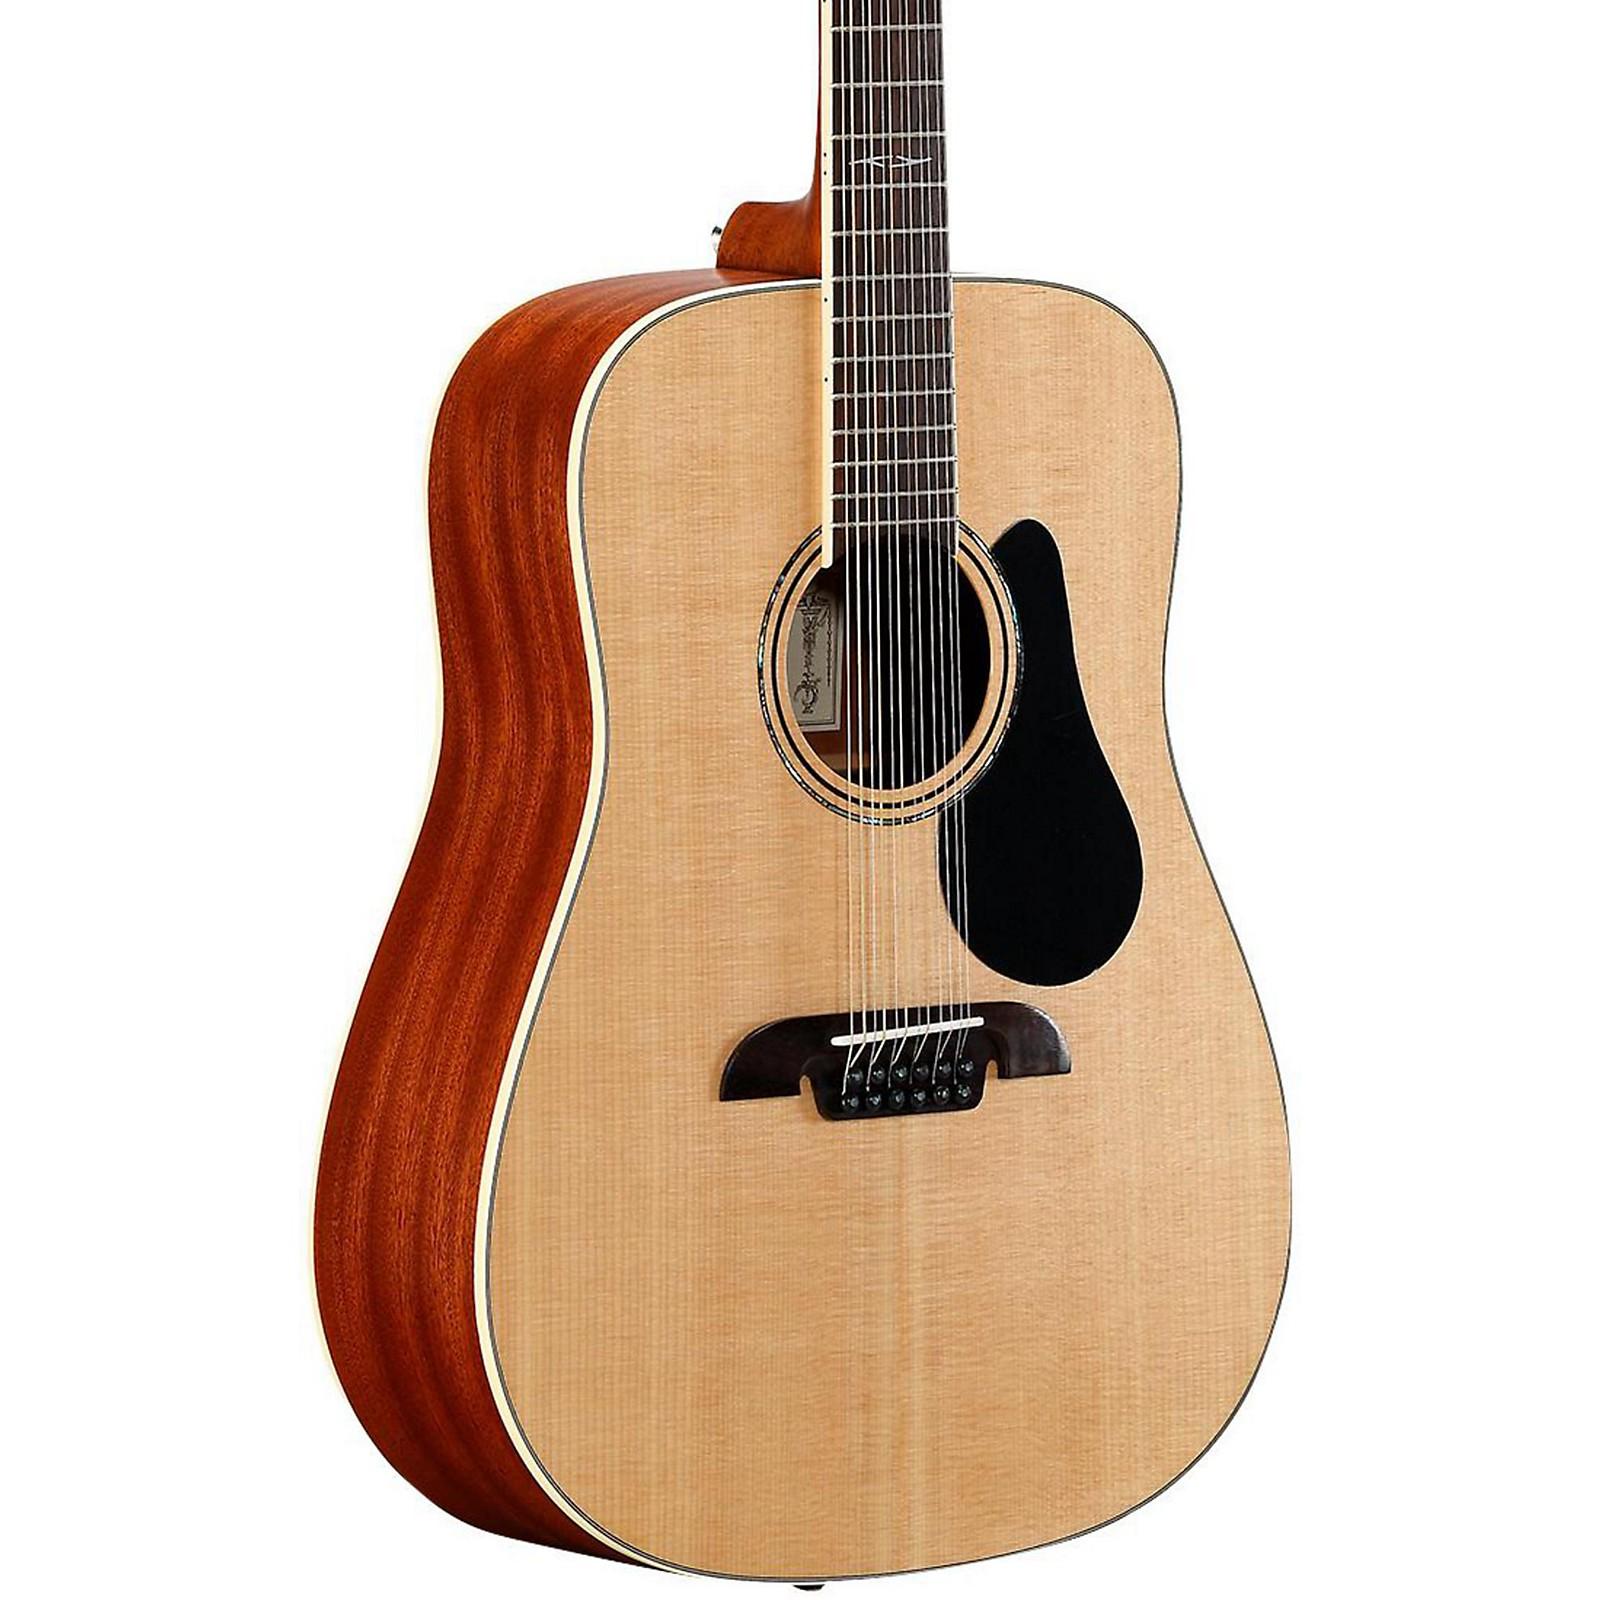 Open Box Alvarez Artist Series AD60-12 Dreadnought Twelve String Acoustic Guitar